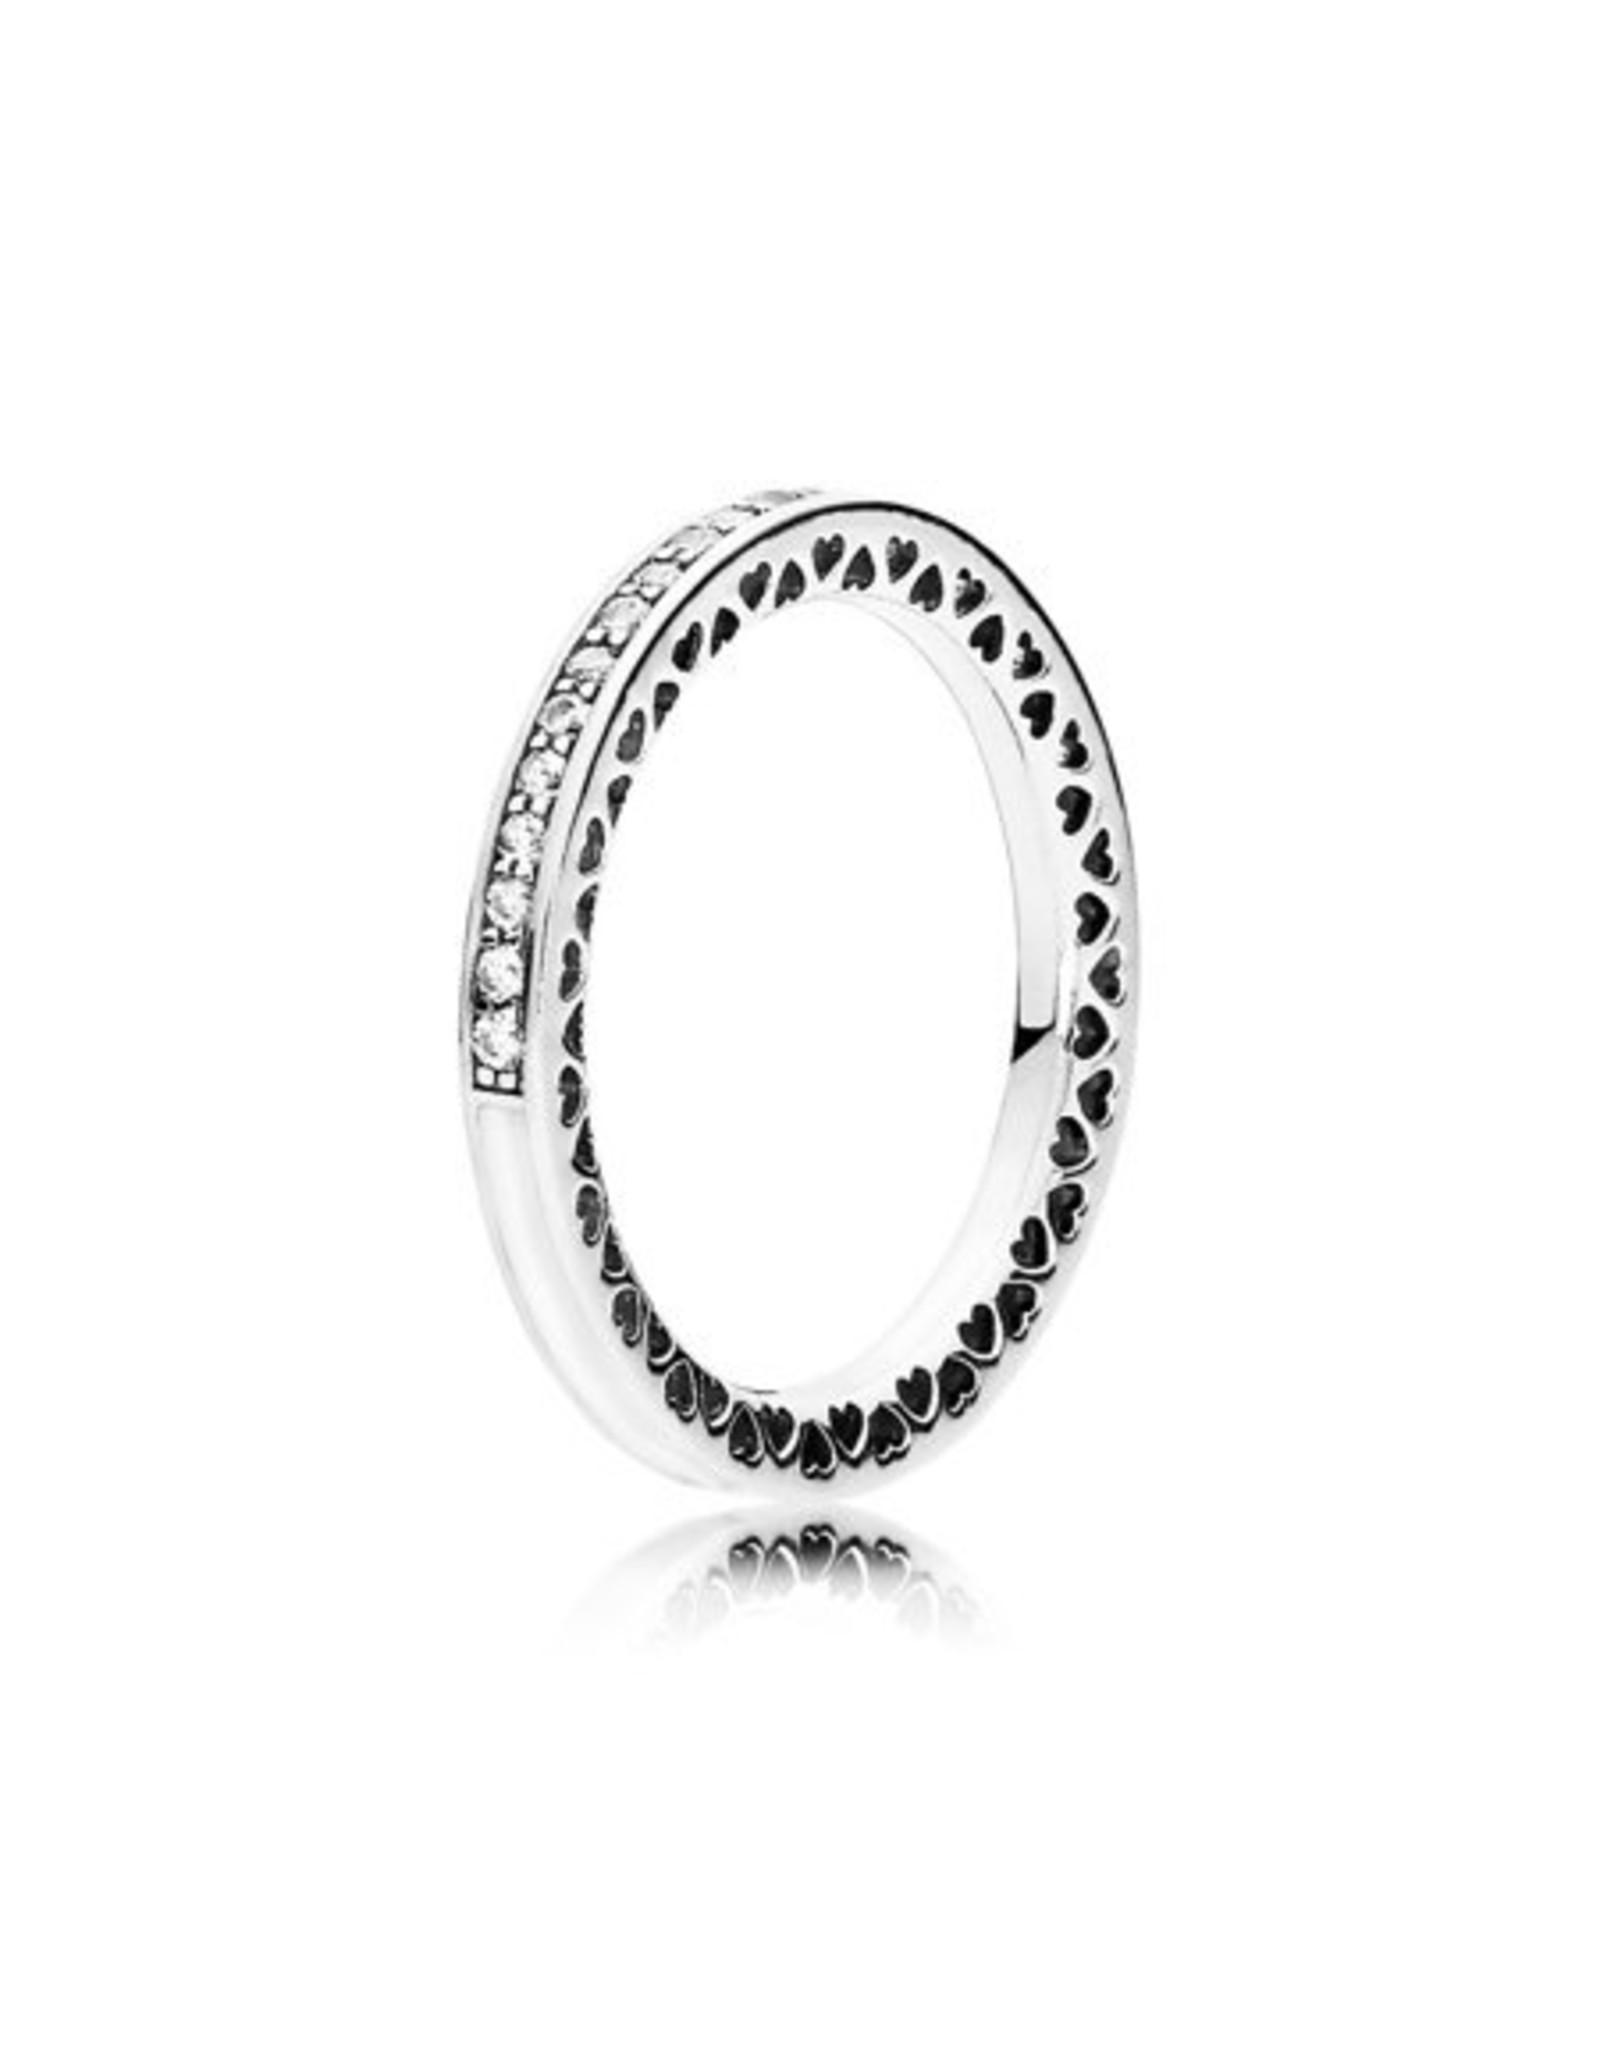 Pandora Pandora Ring, Radiant Hearts Of Pandora, Silver Enamel & Clear CZ